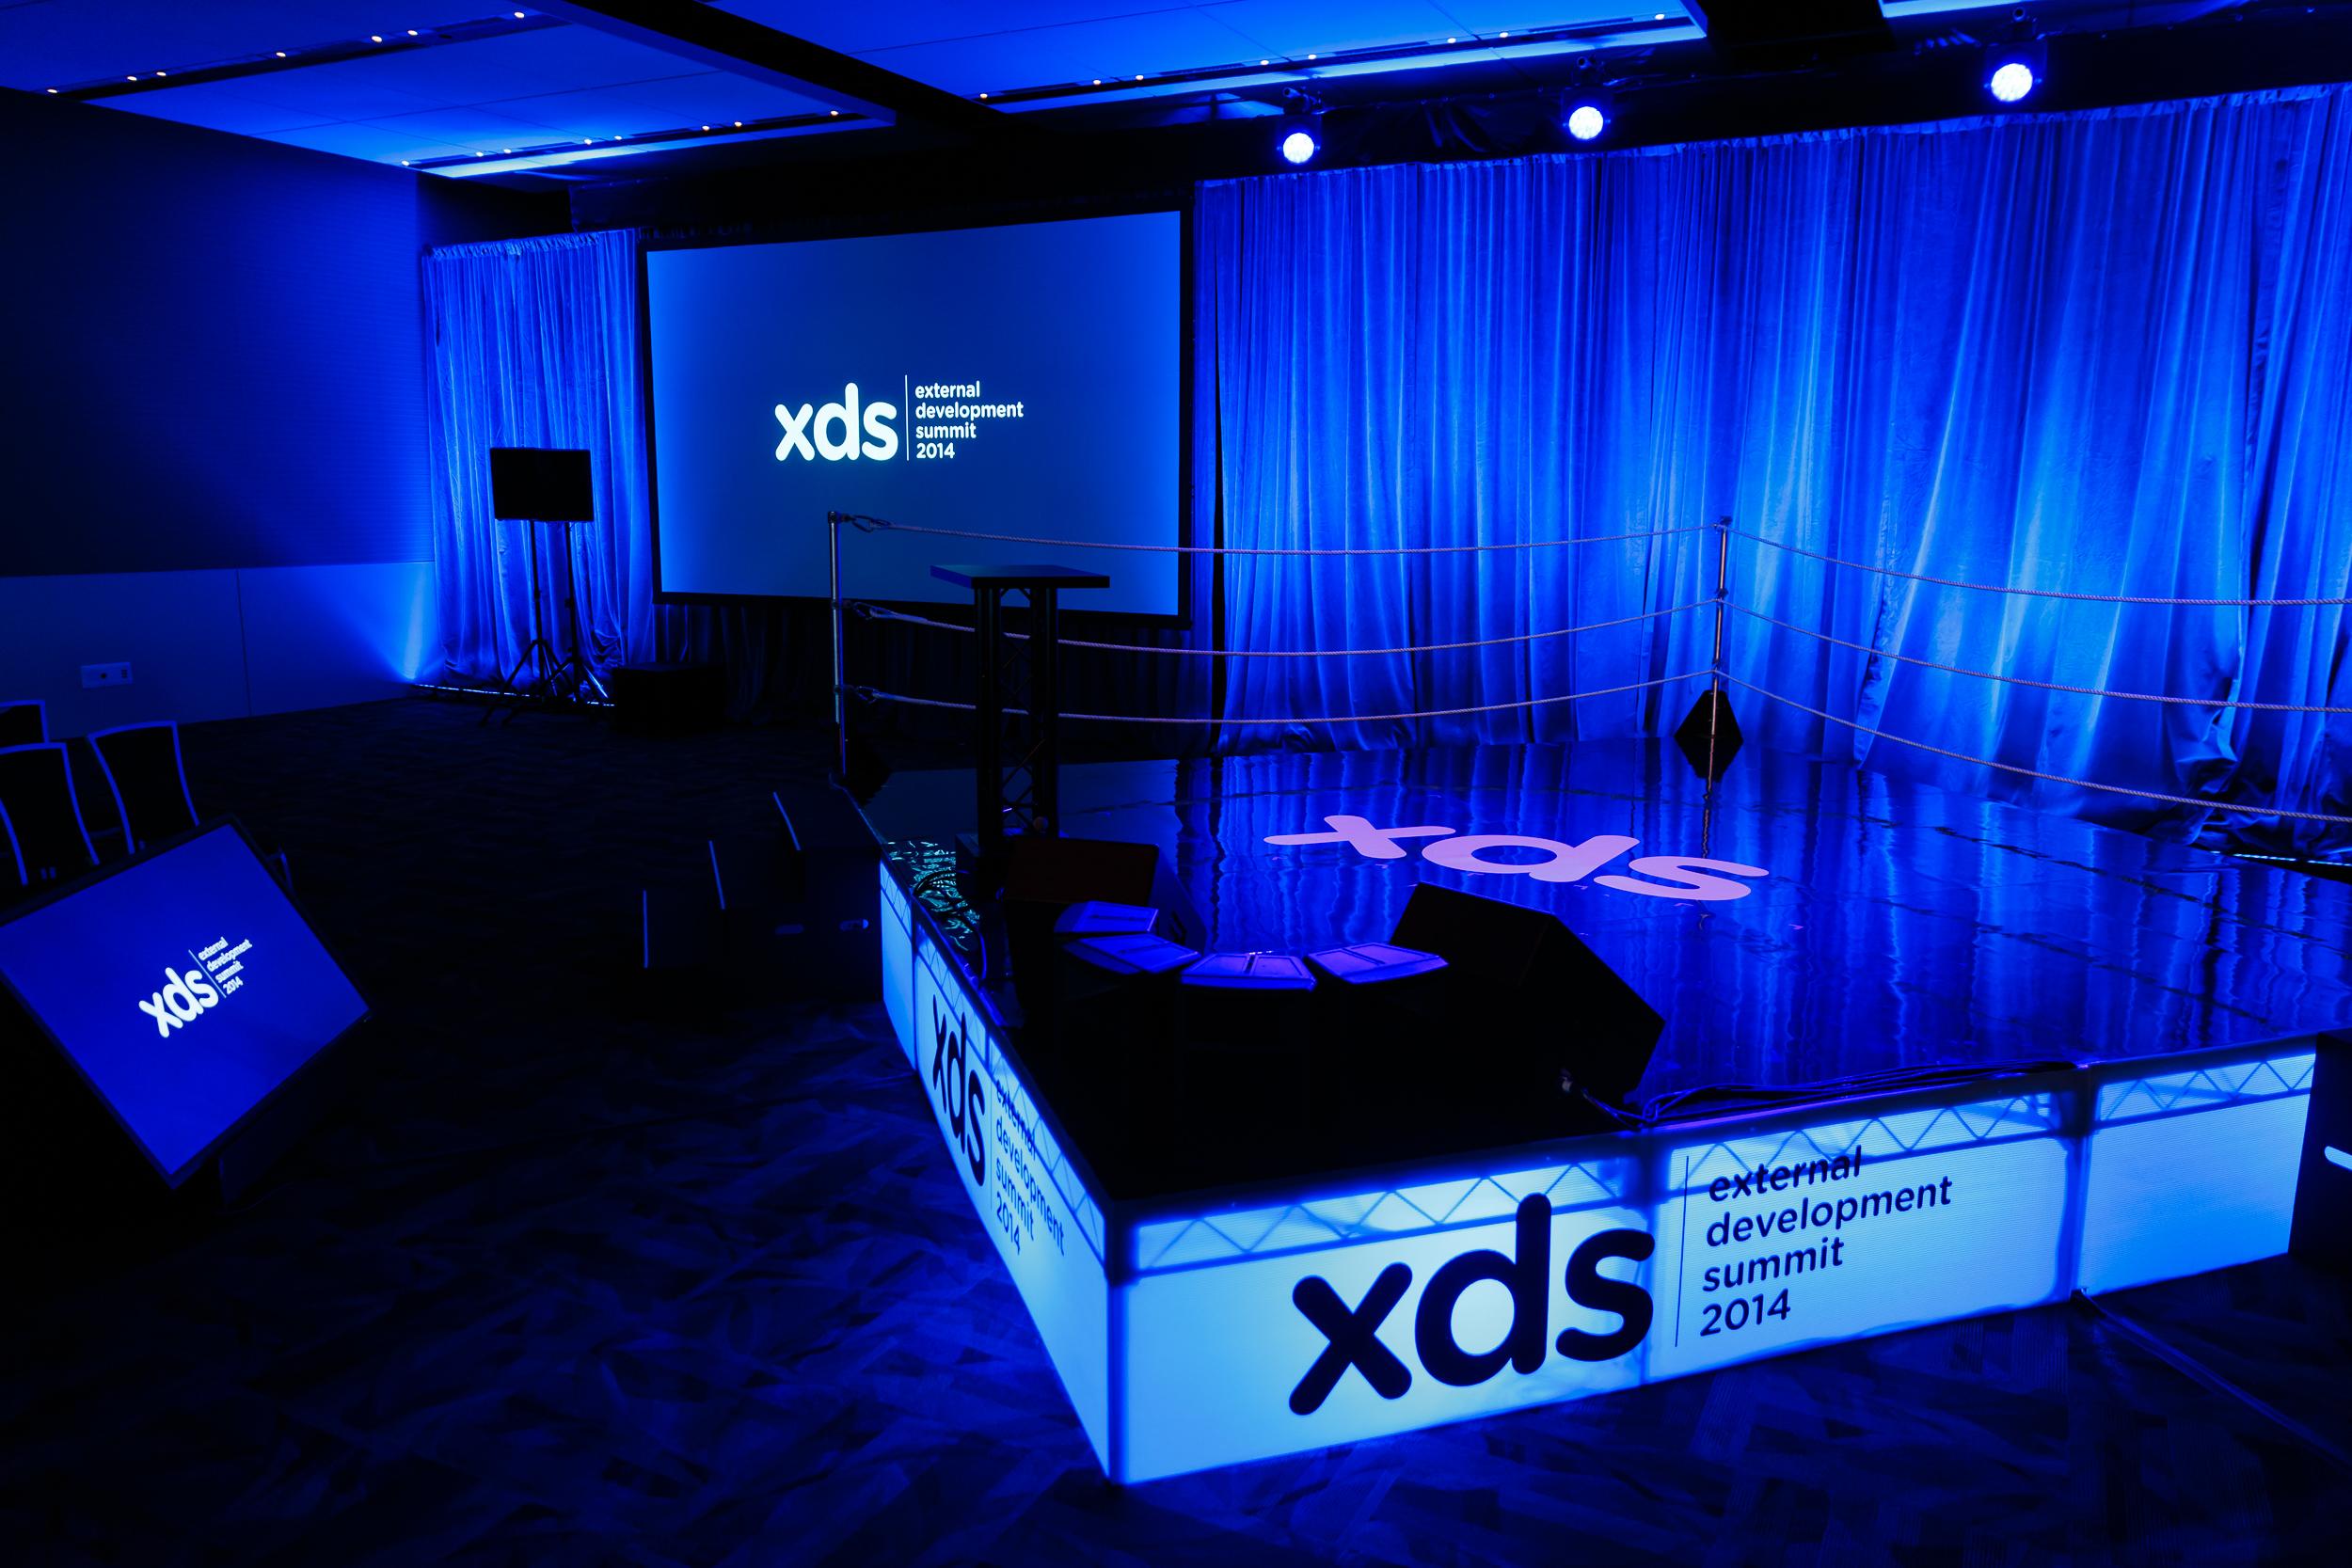 XDS-2014_image16.jpg